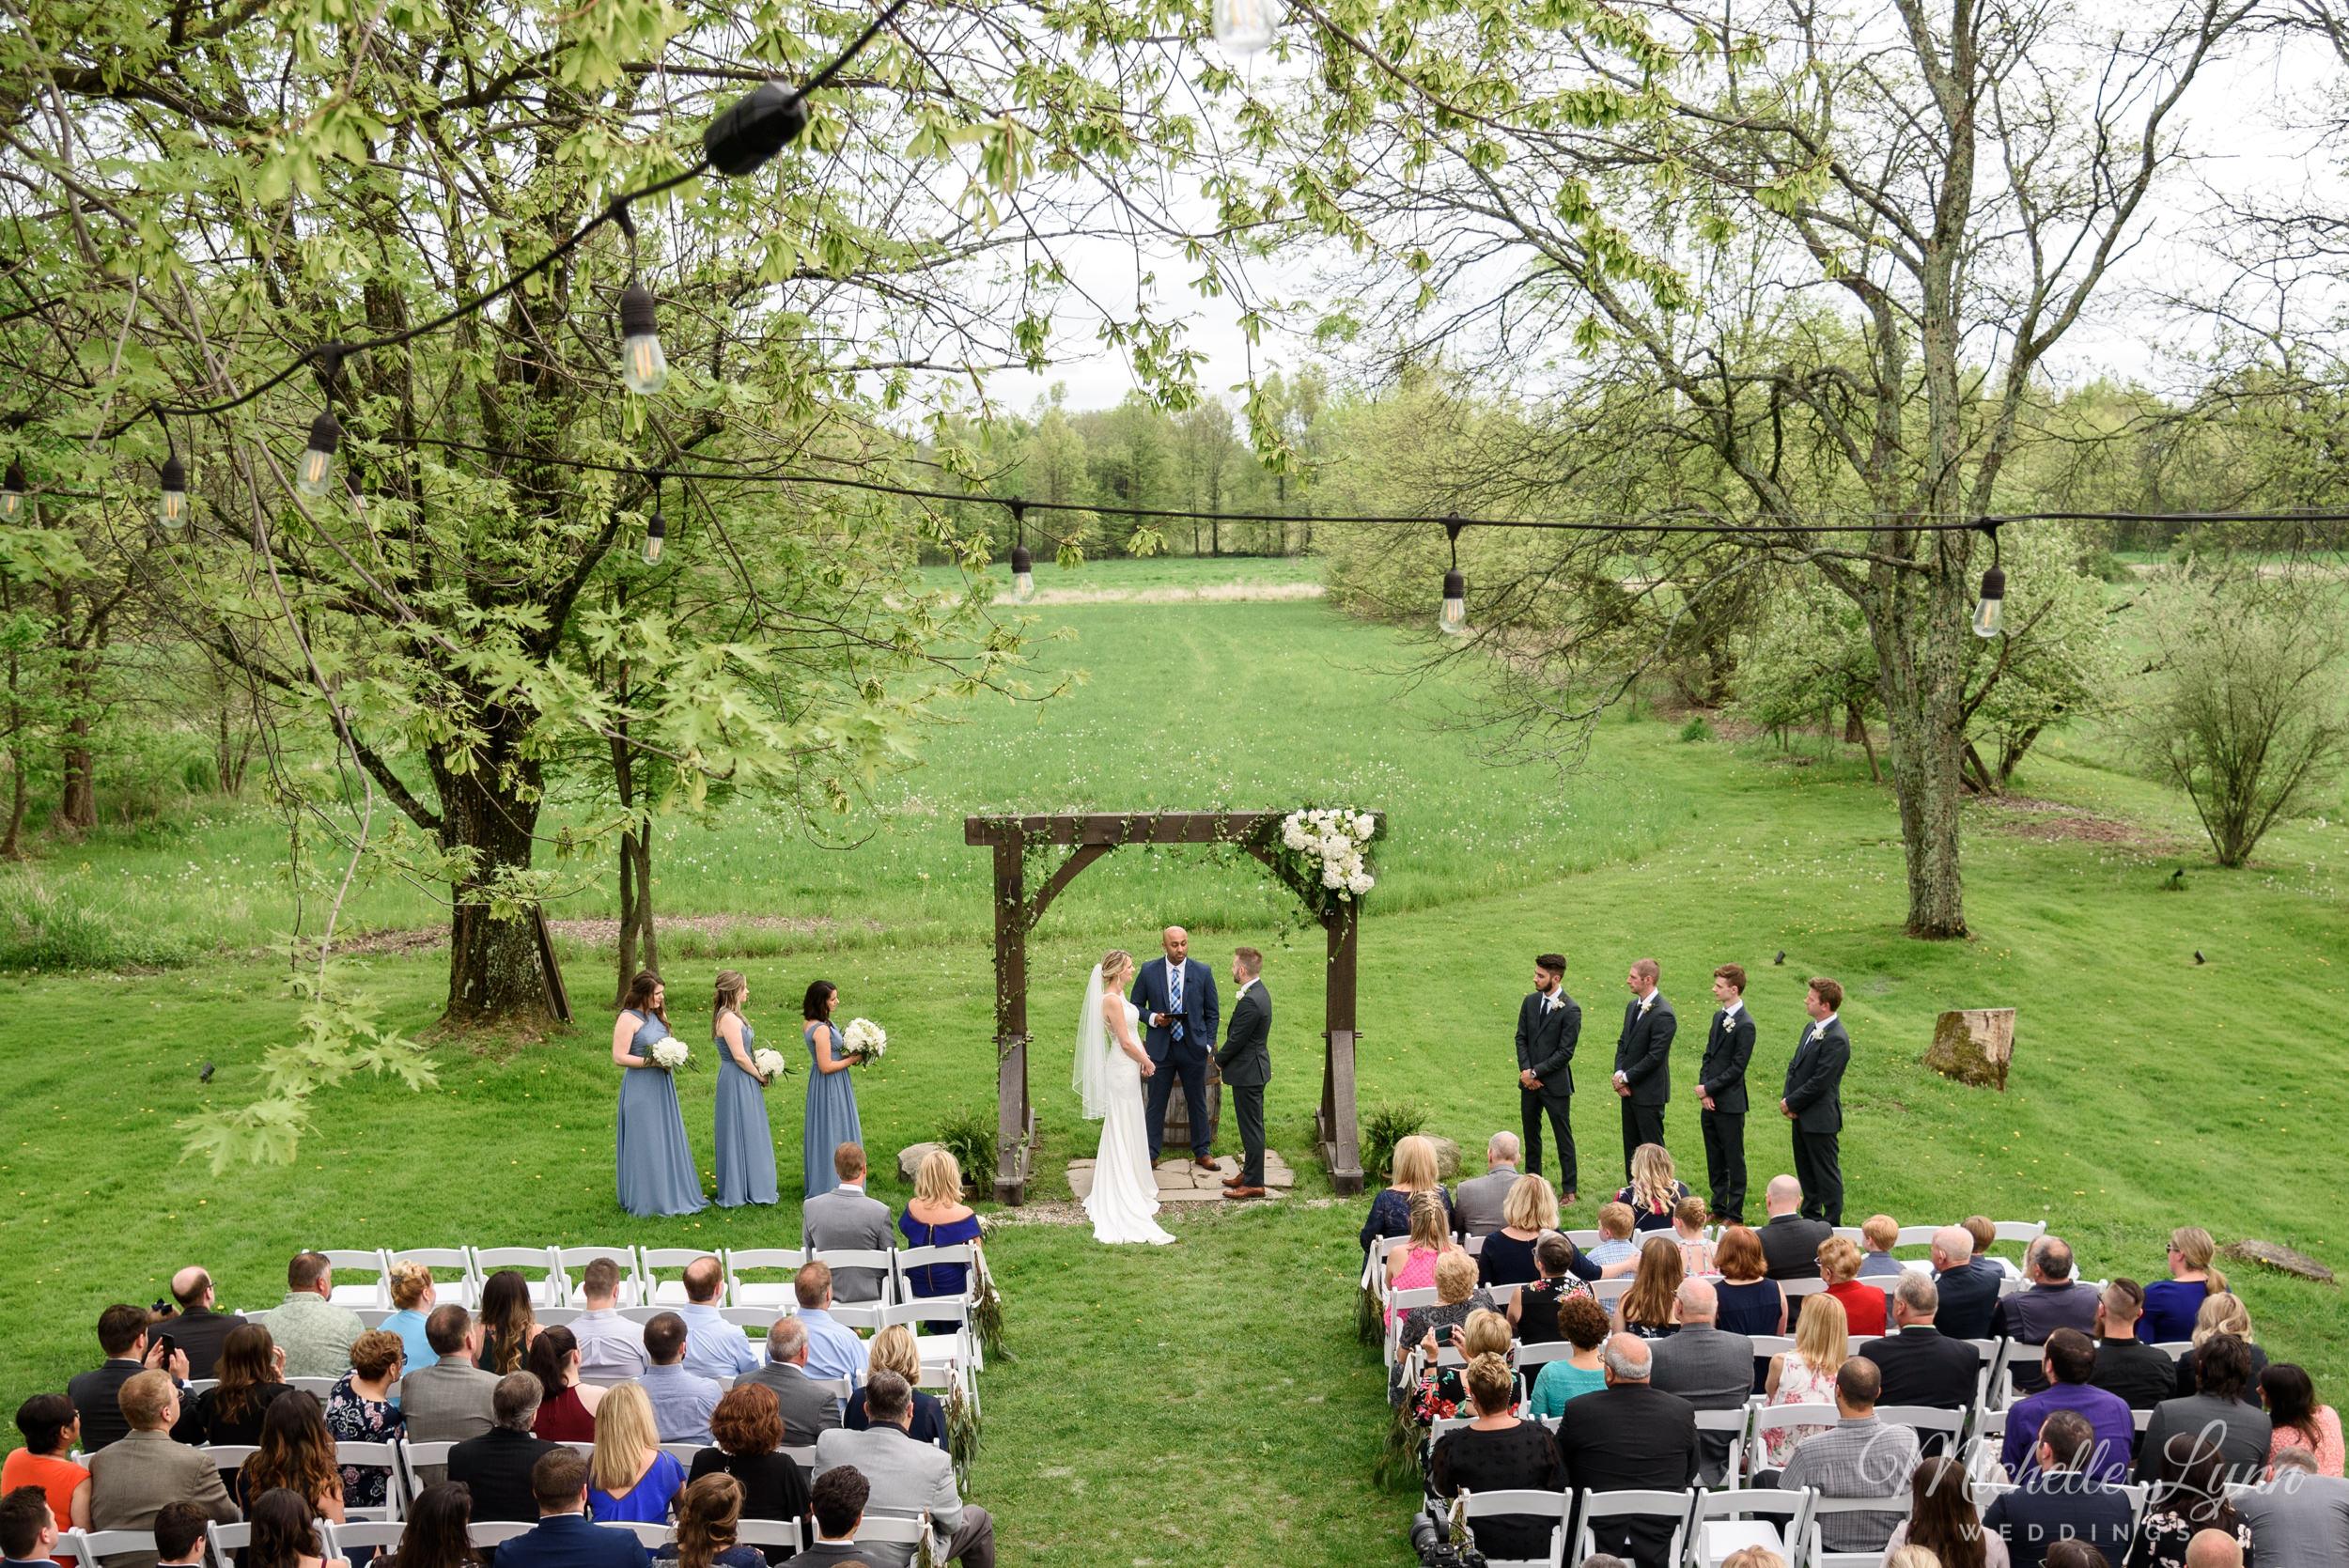 mlw-the-farm-bakery-and-events-wedding-photos-36.jpg